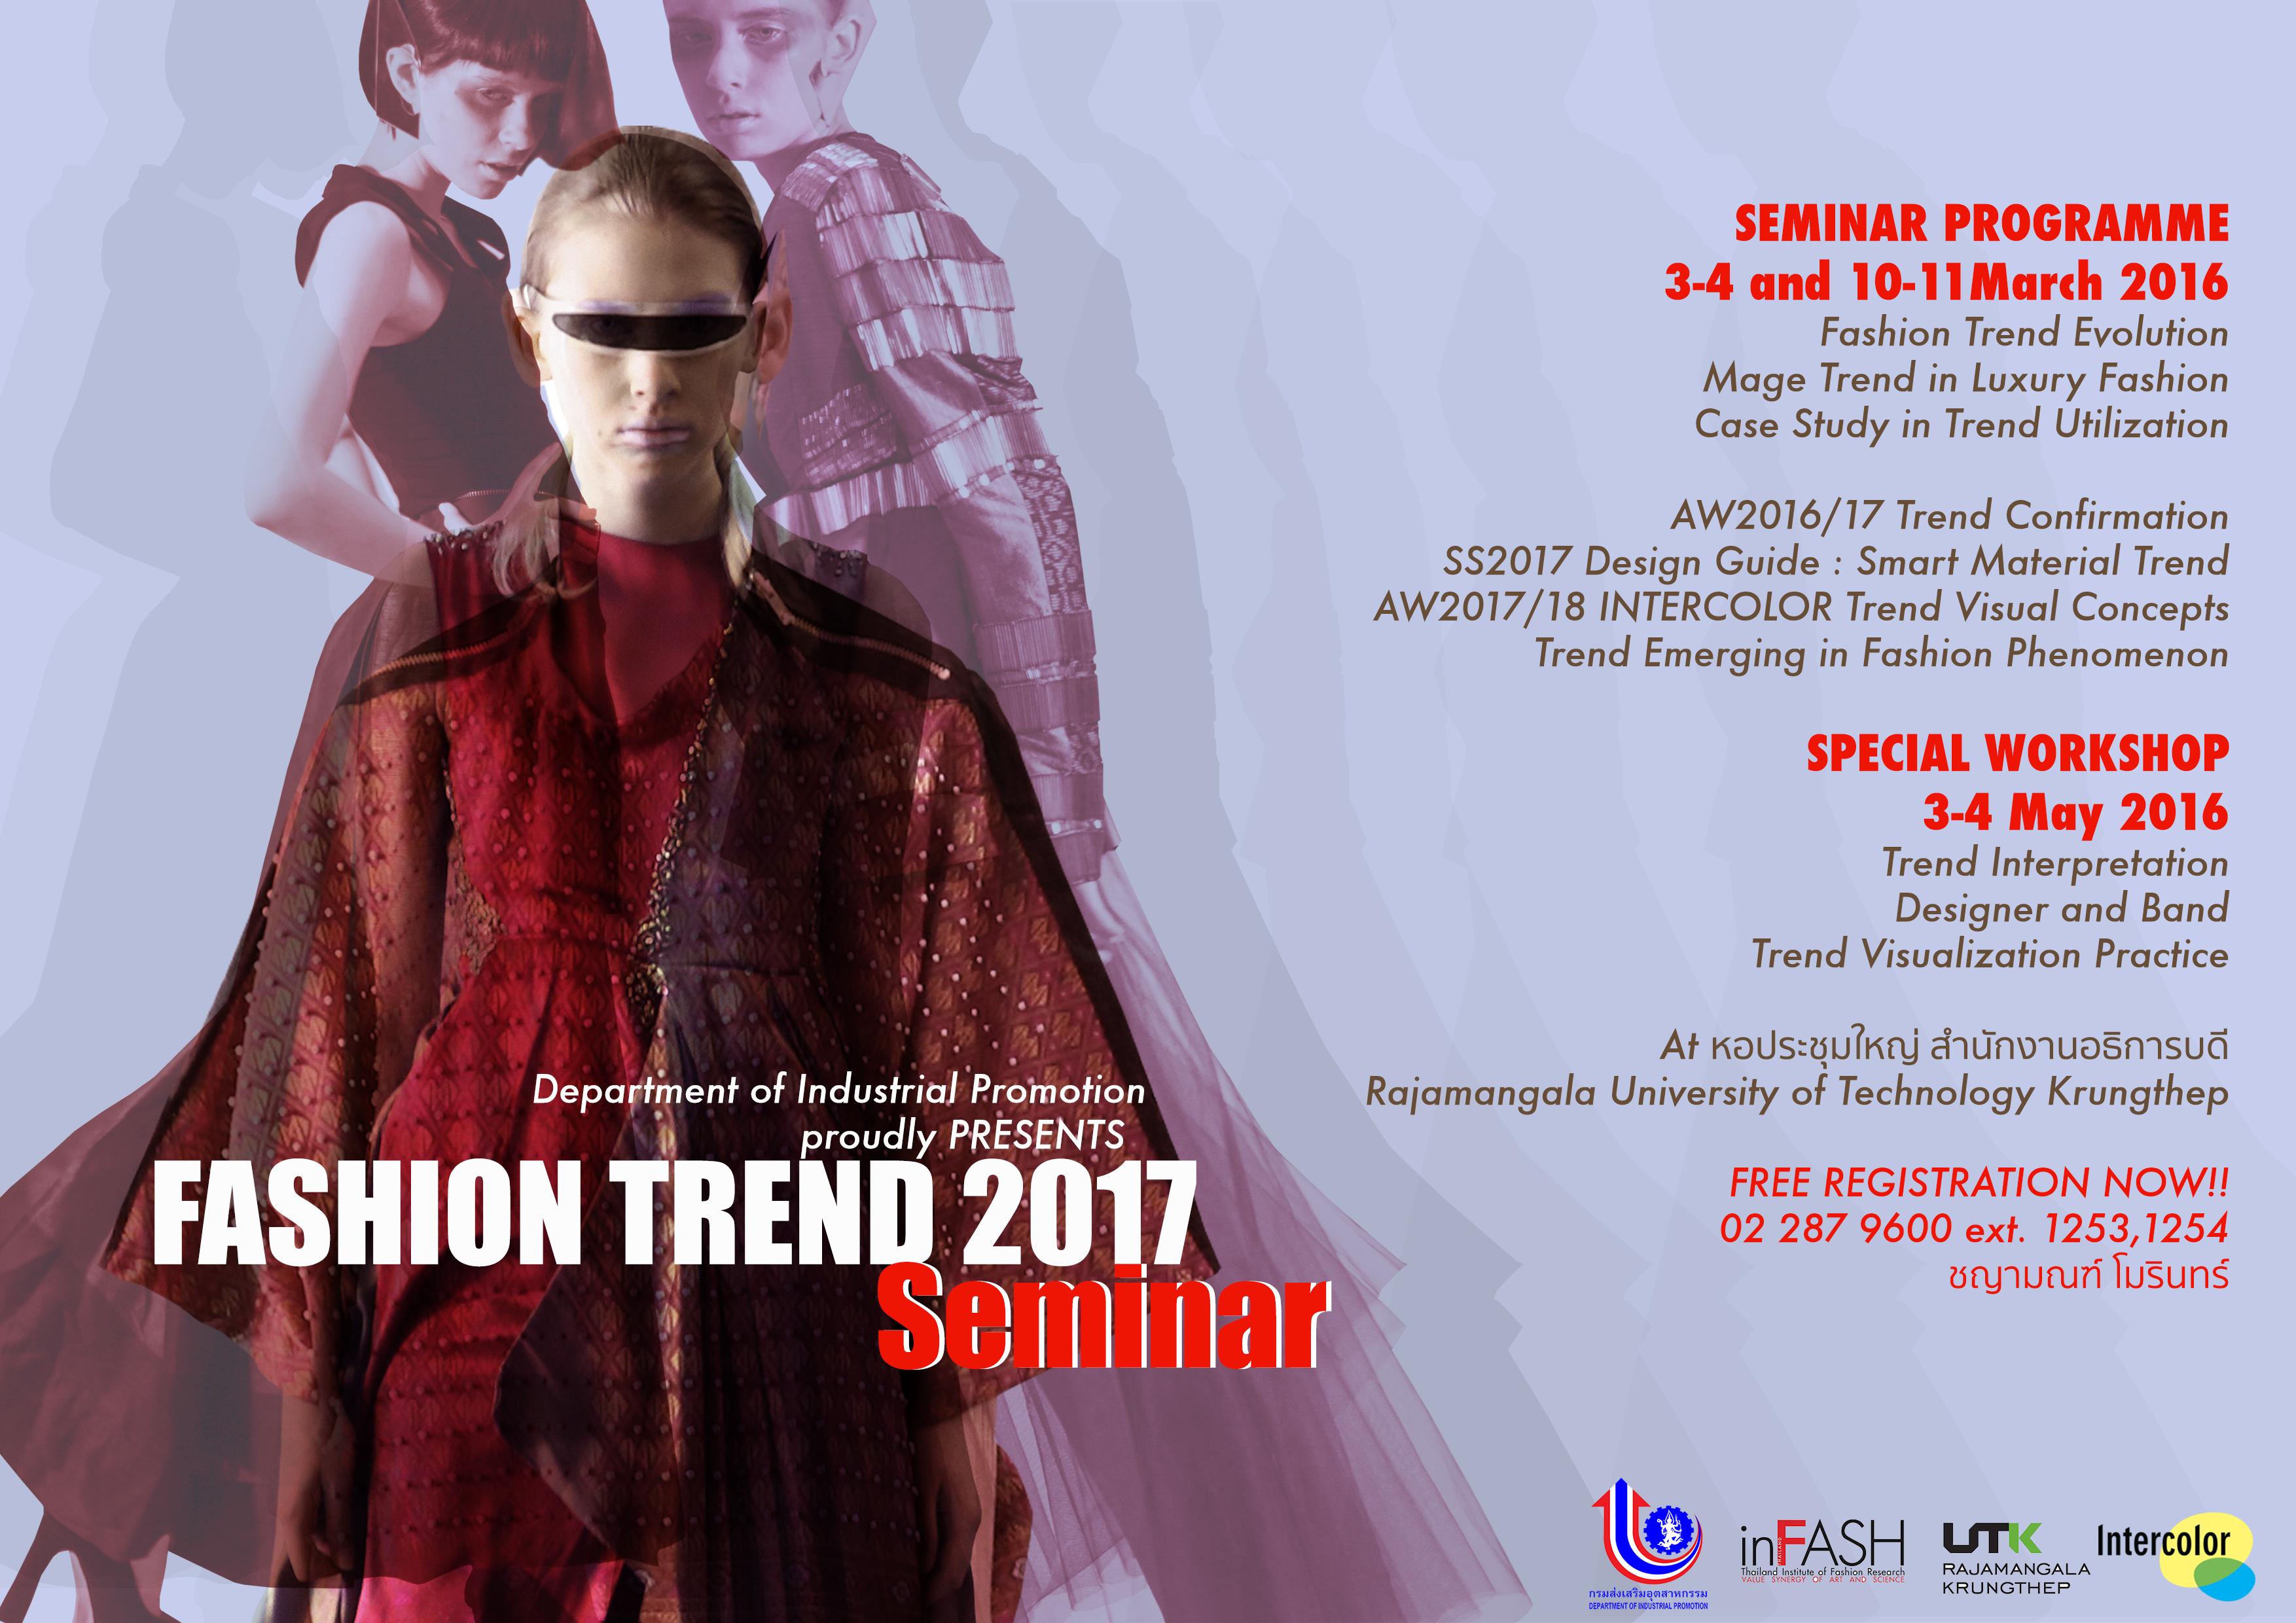 Fashion trend 2017